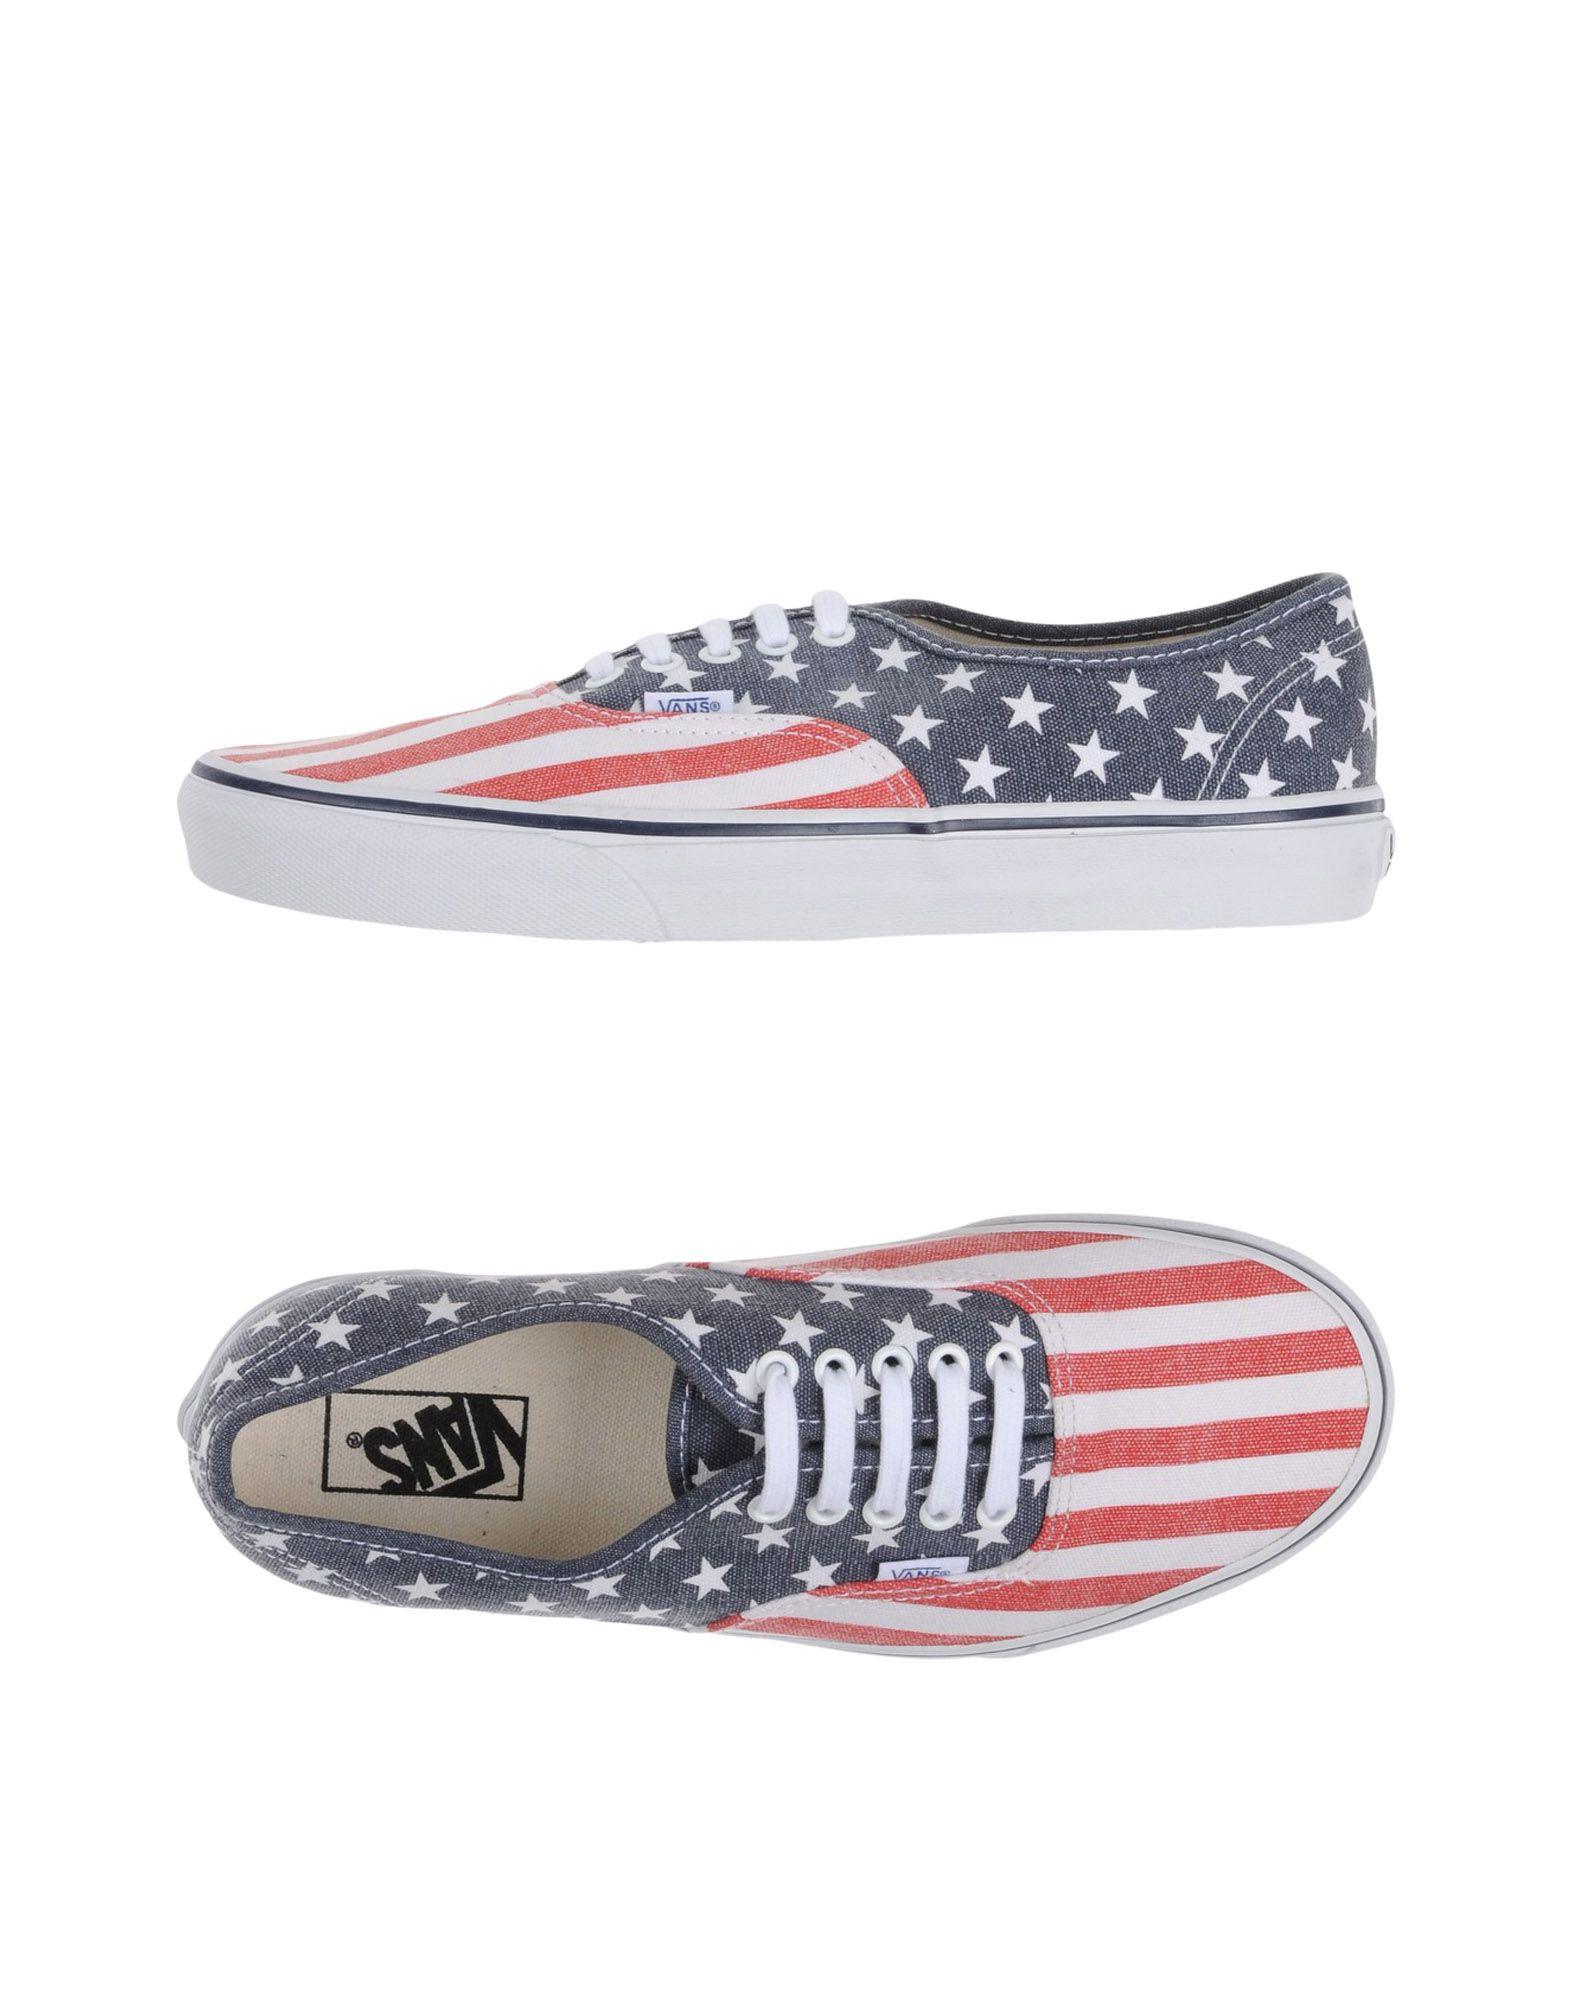 64c00817911 Vans Sneakers - Men Vans Sneakers online on YOOX Estonia - 11246838